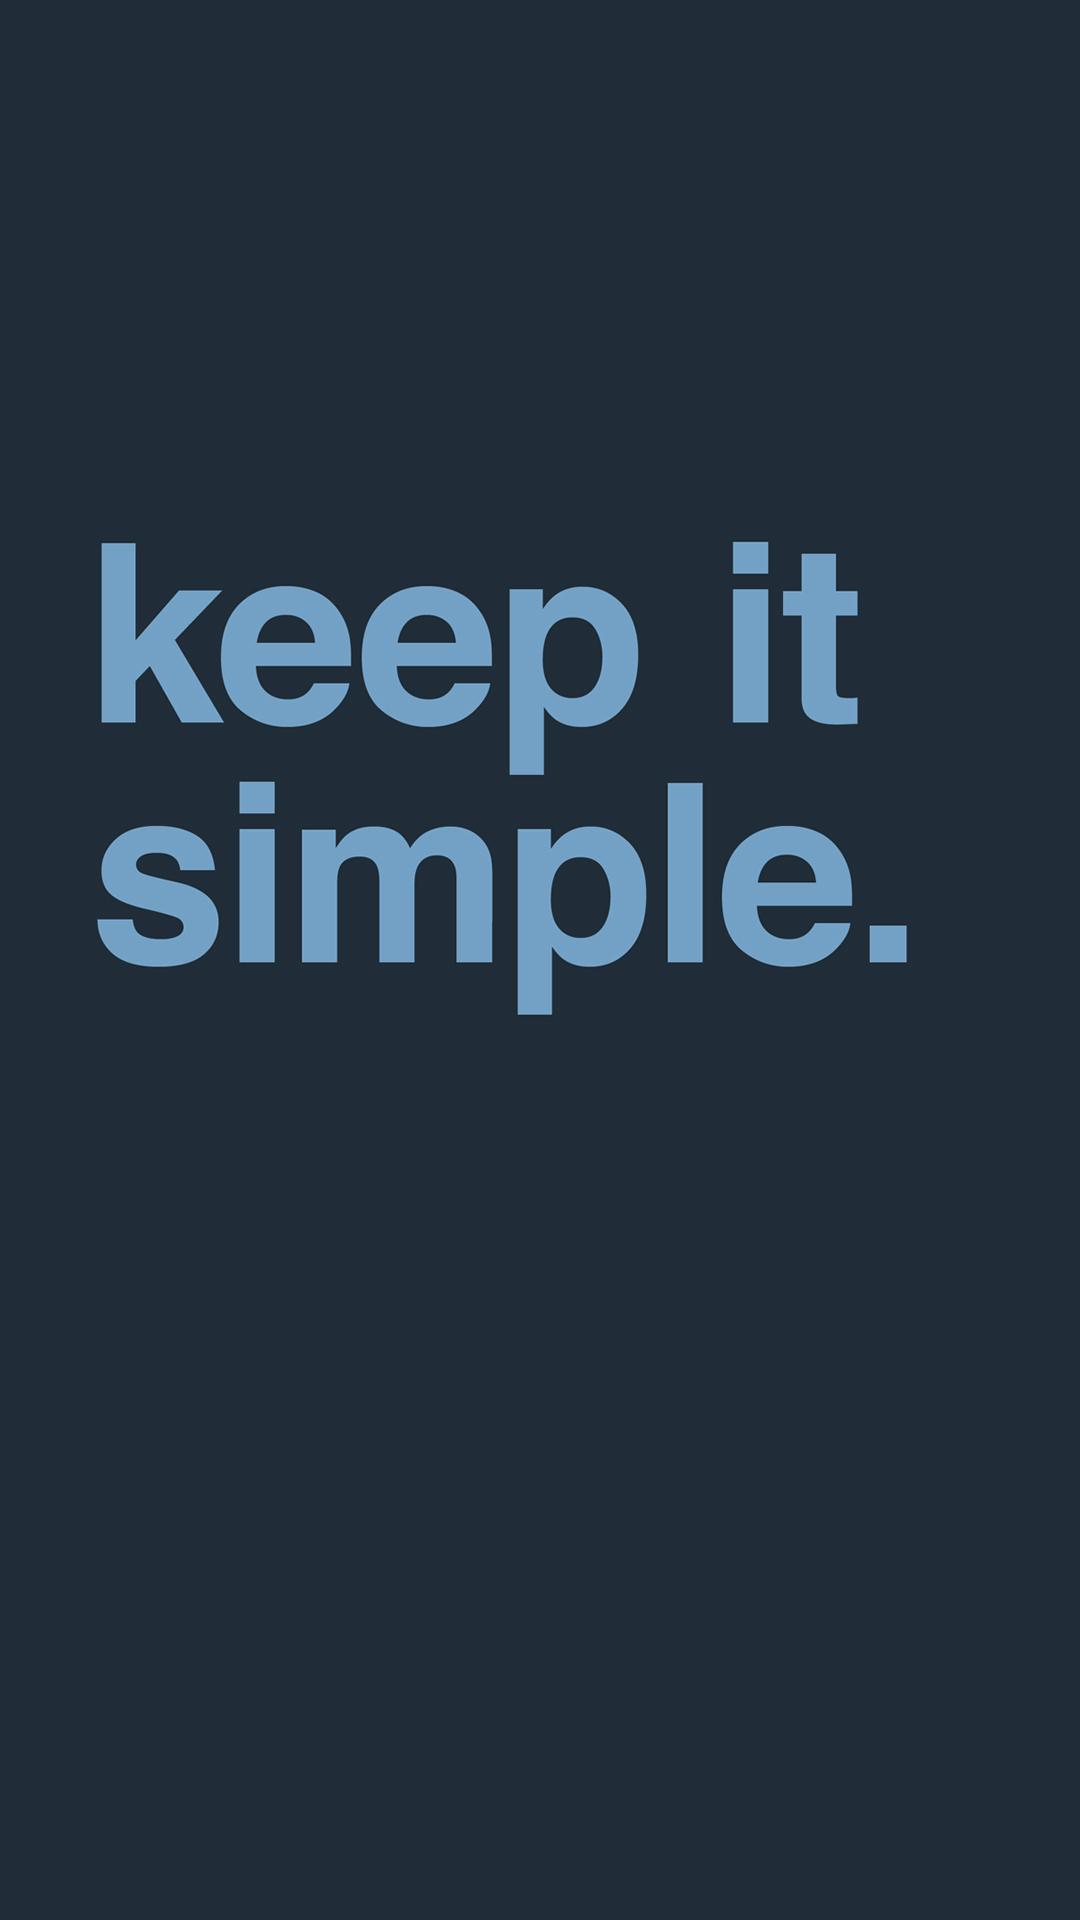 Keep It Simple Iphone Wallpaper Hd